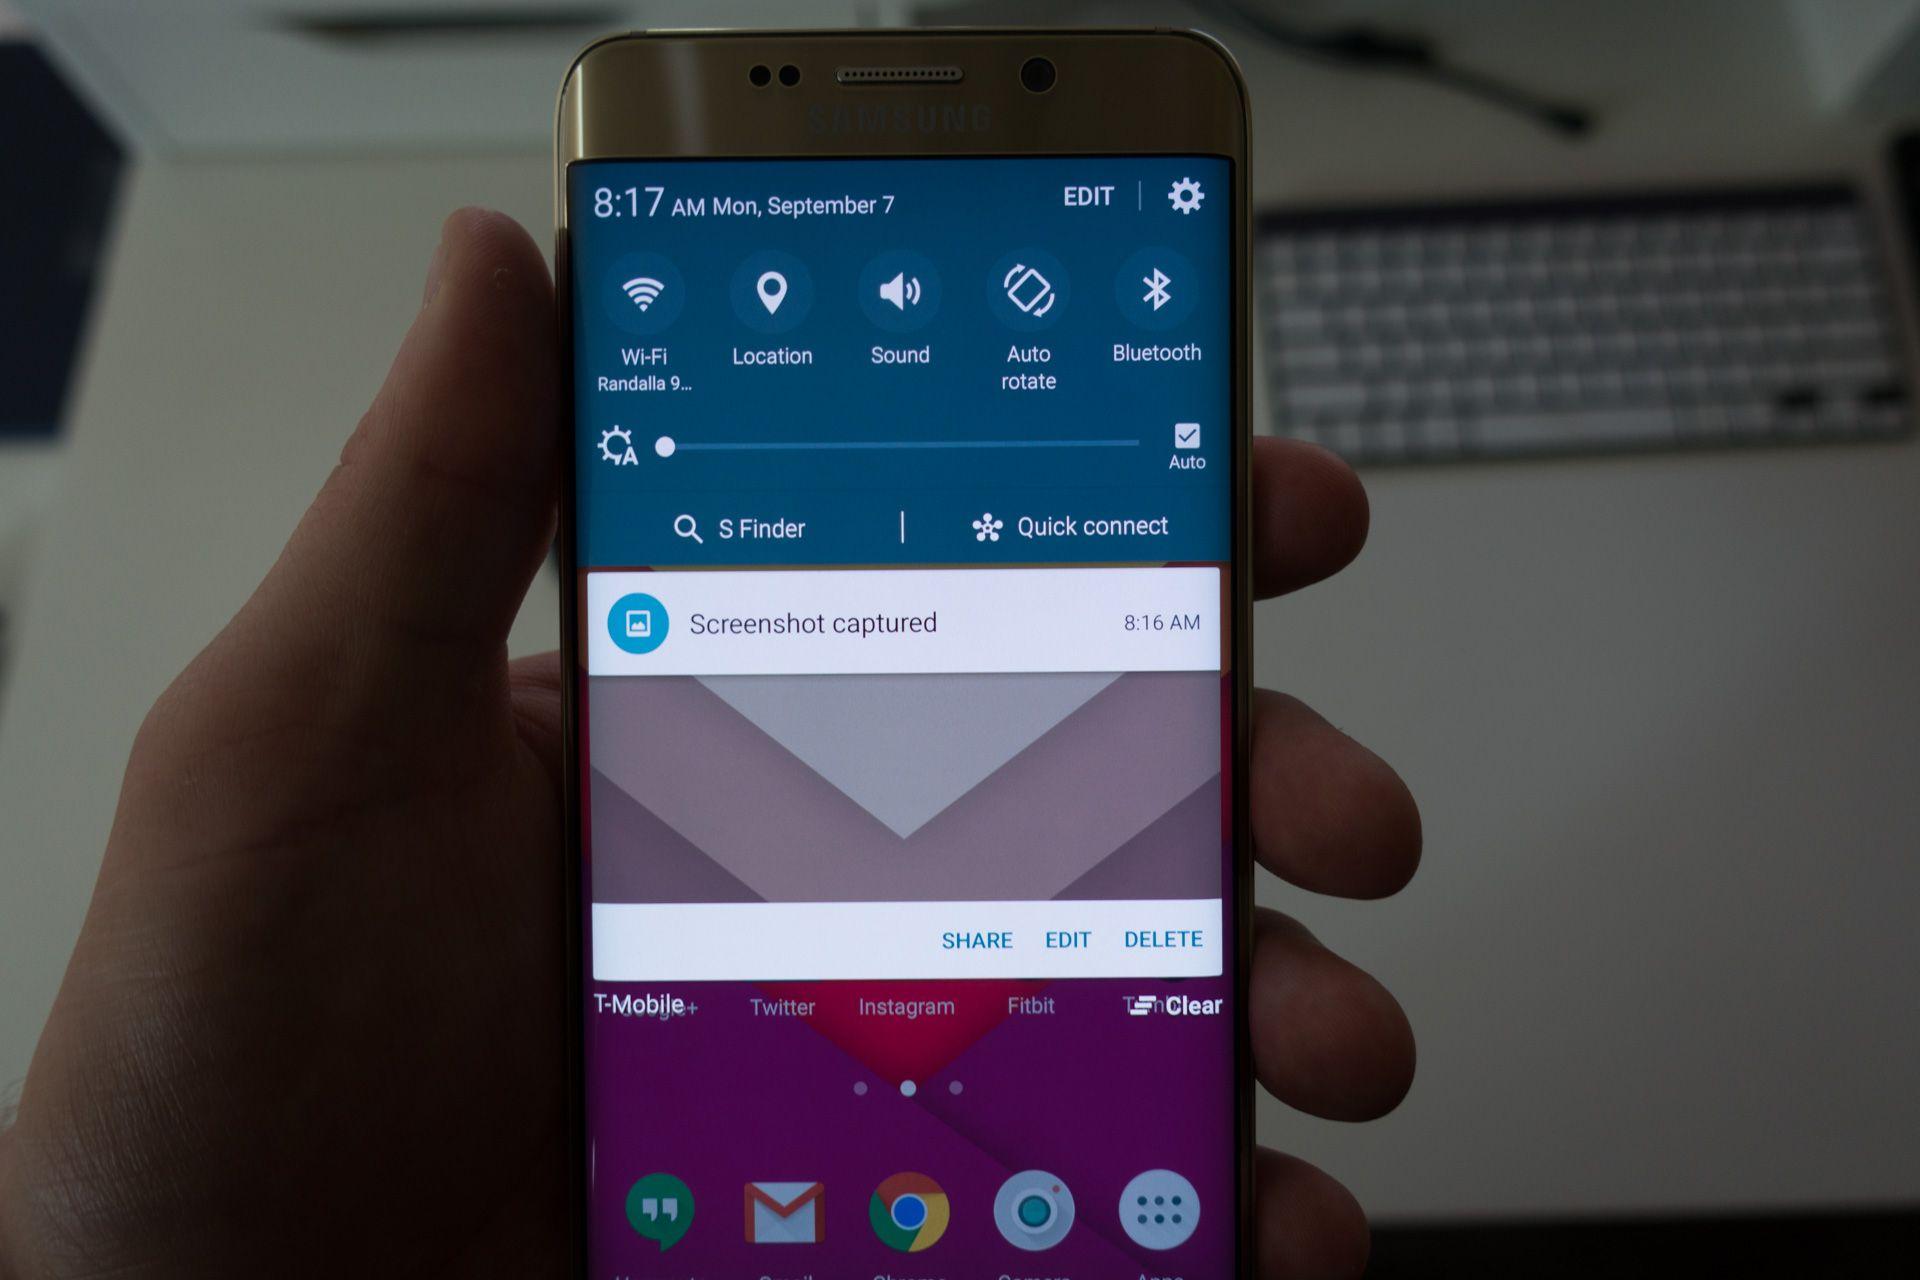 How To Screenshot On Samsung S6